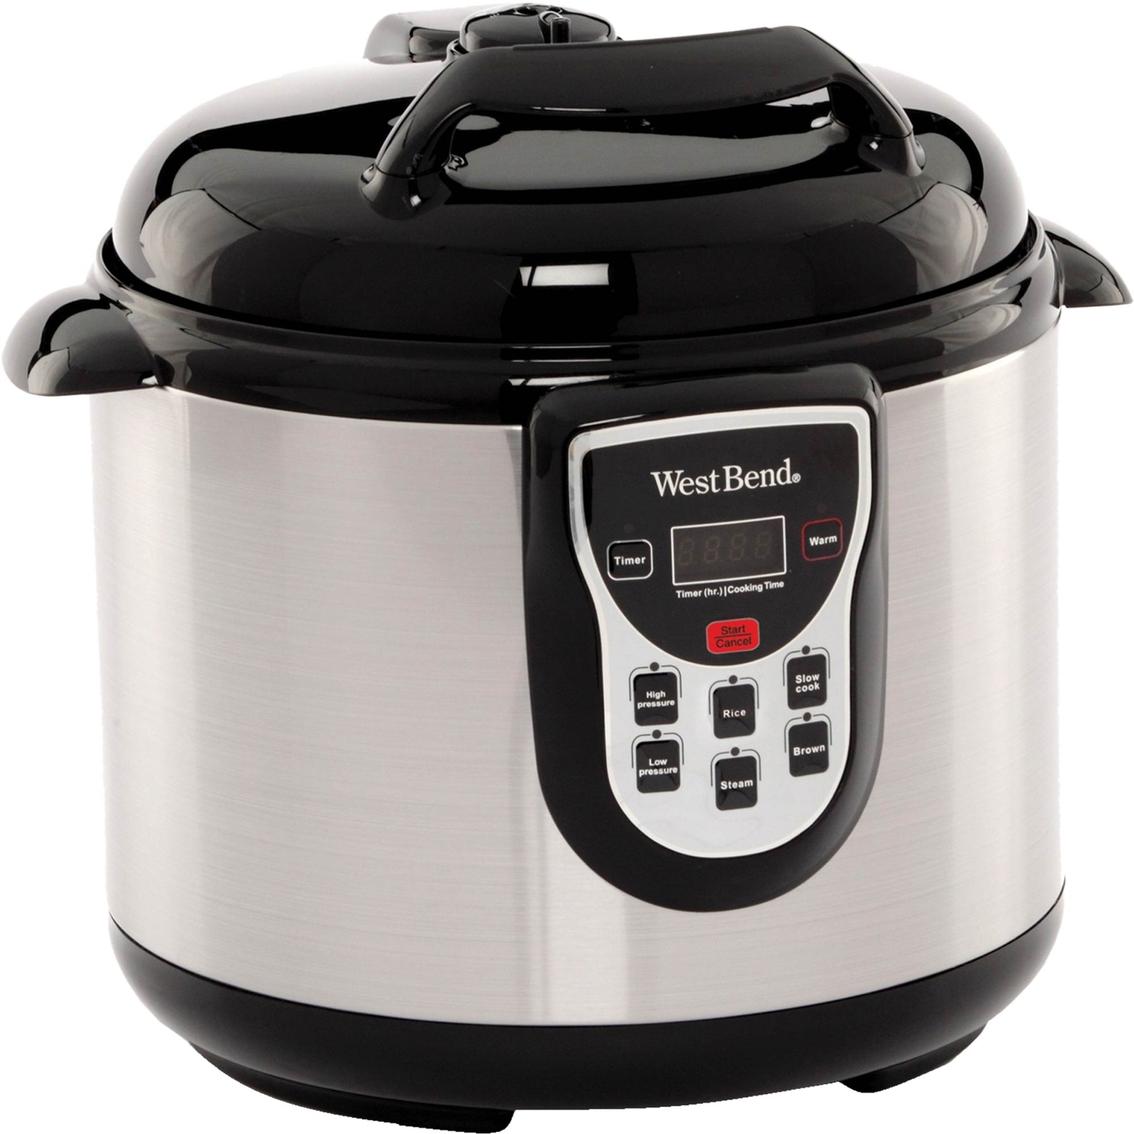 Uncategorized West Bend Kitchen Appliances west bend 6 qt electric pressure cooker cookers home cooker